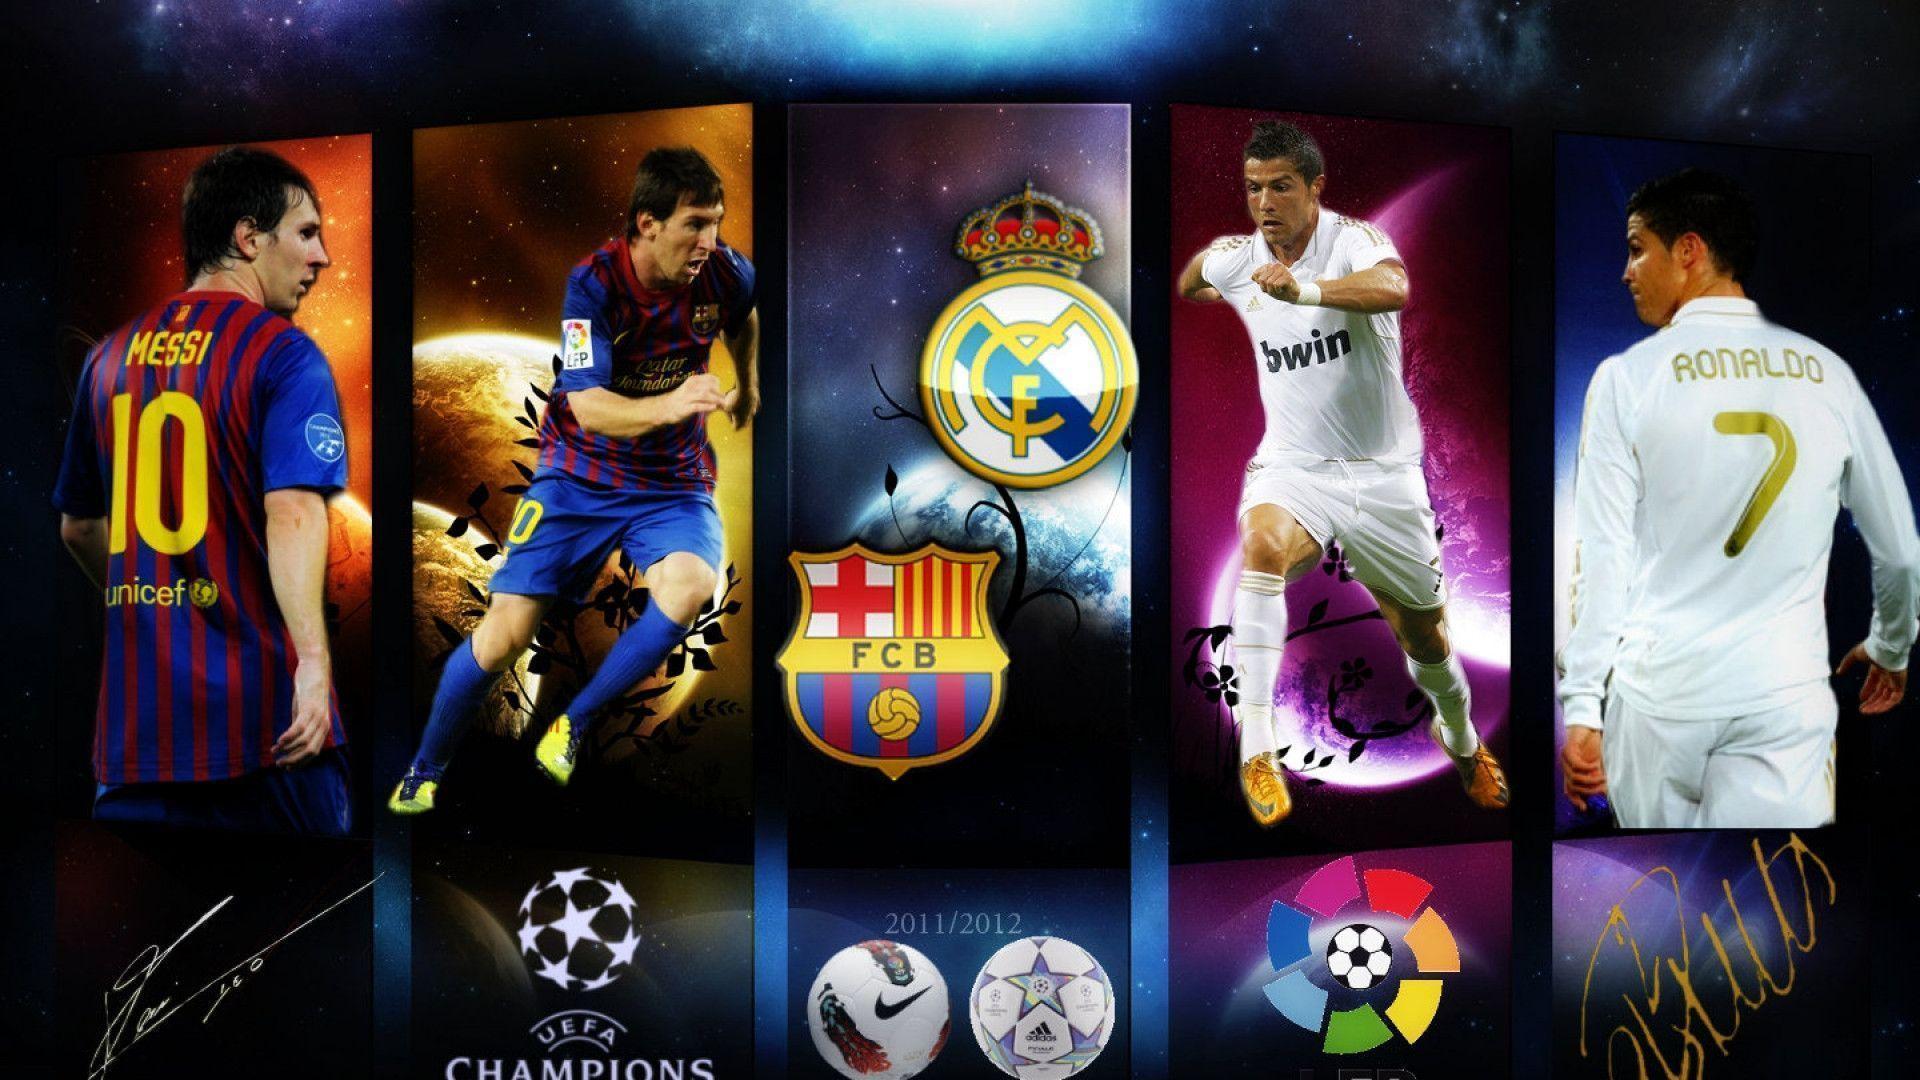 Soccer Wallpaper For Desktop: Soccer Desktop Backgrounds